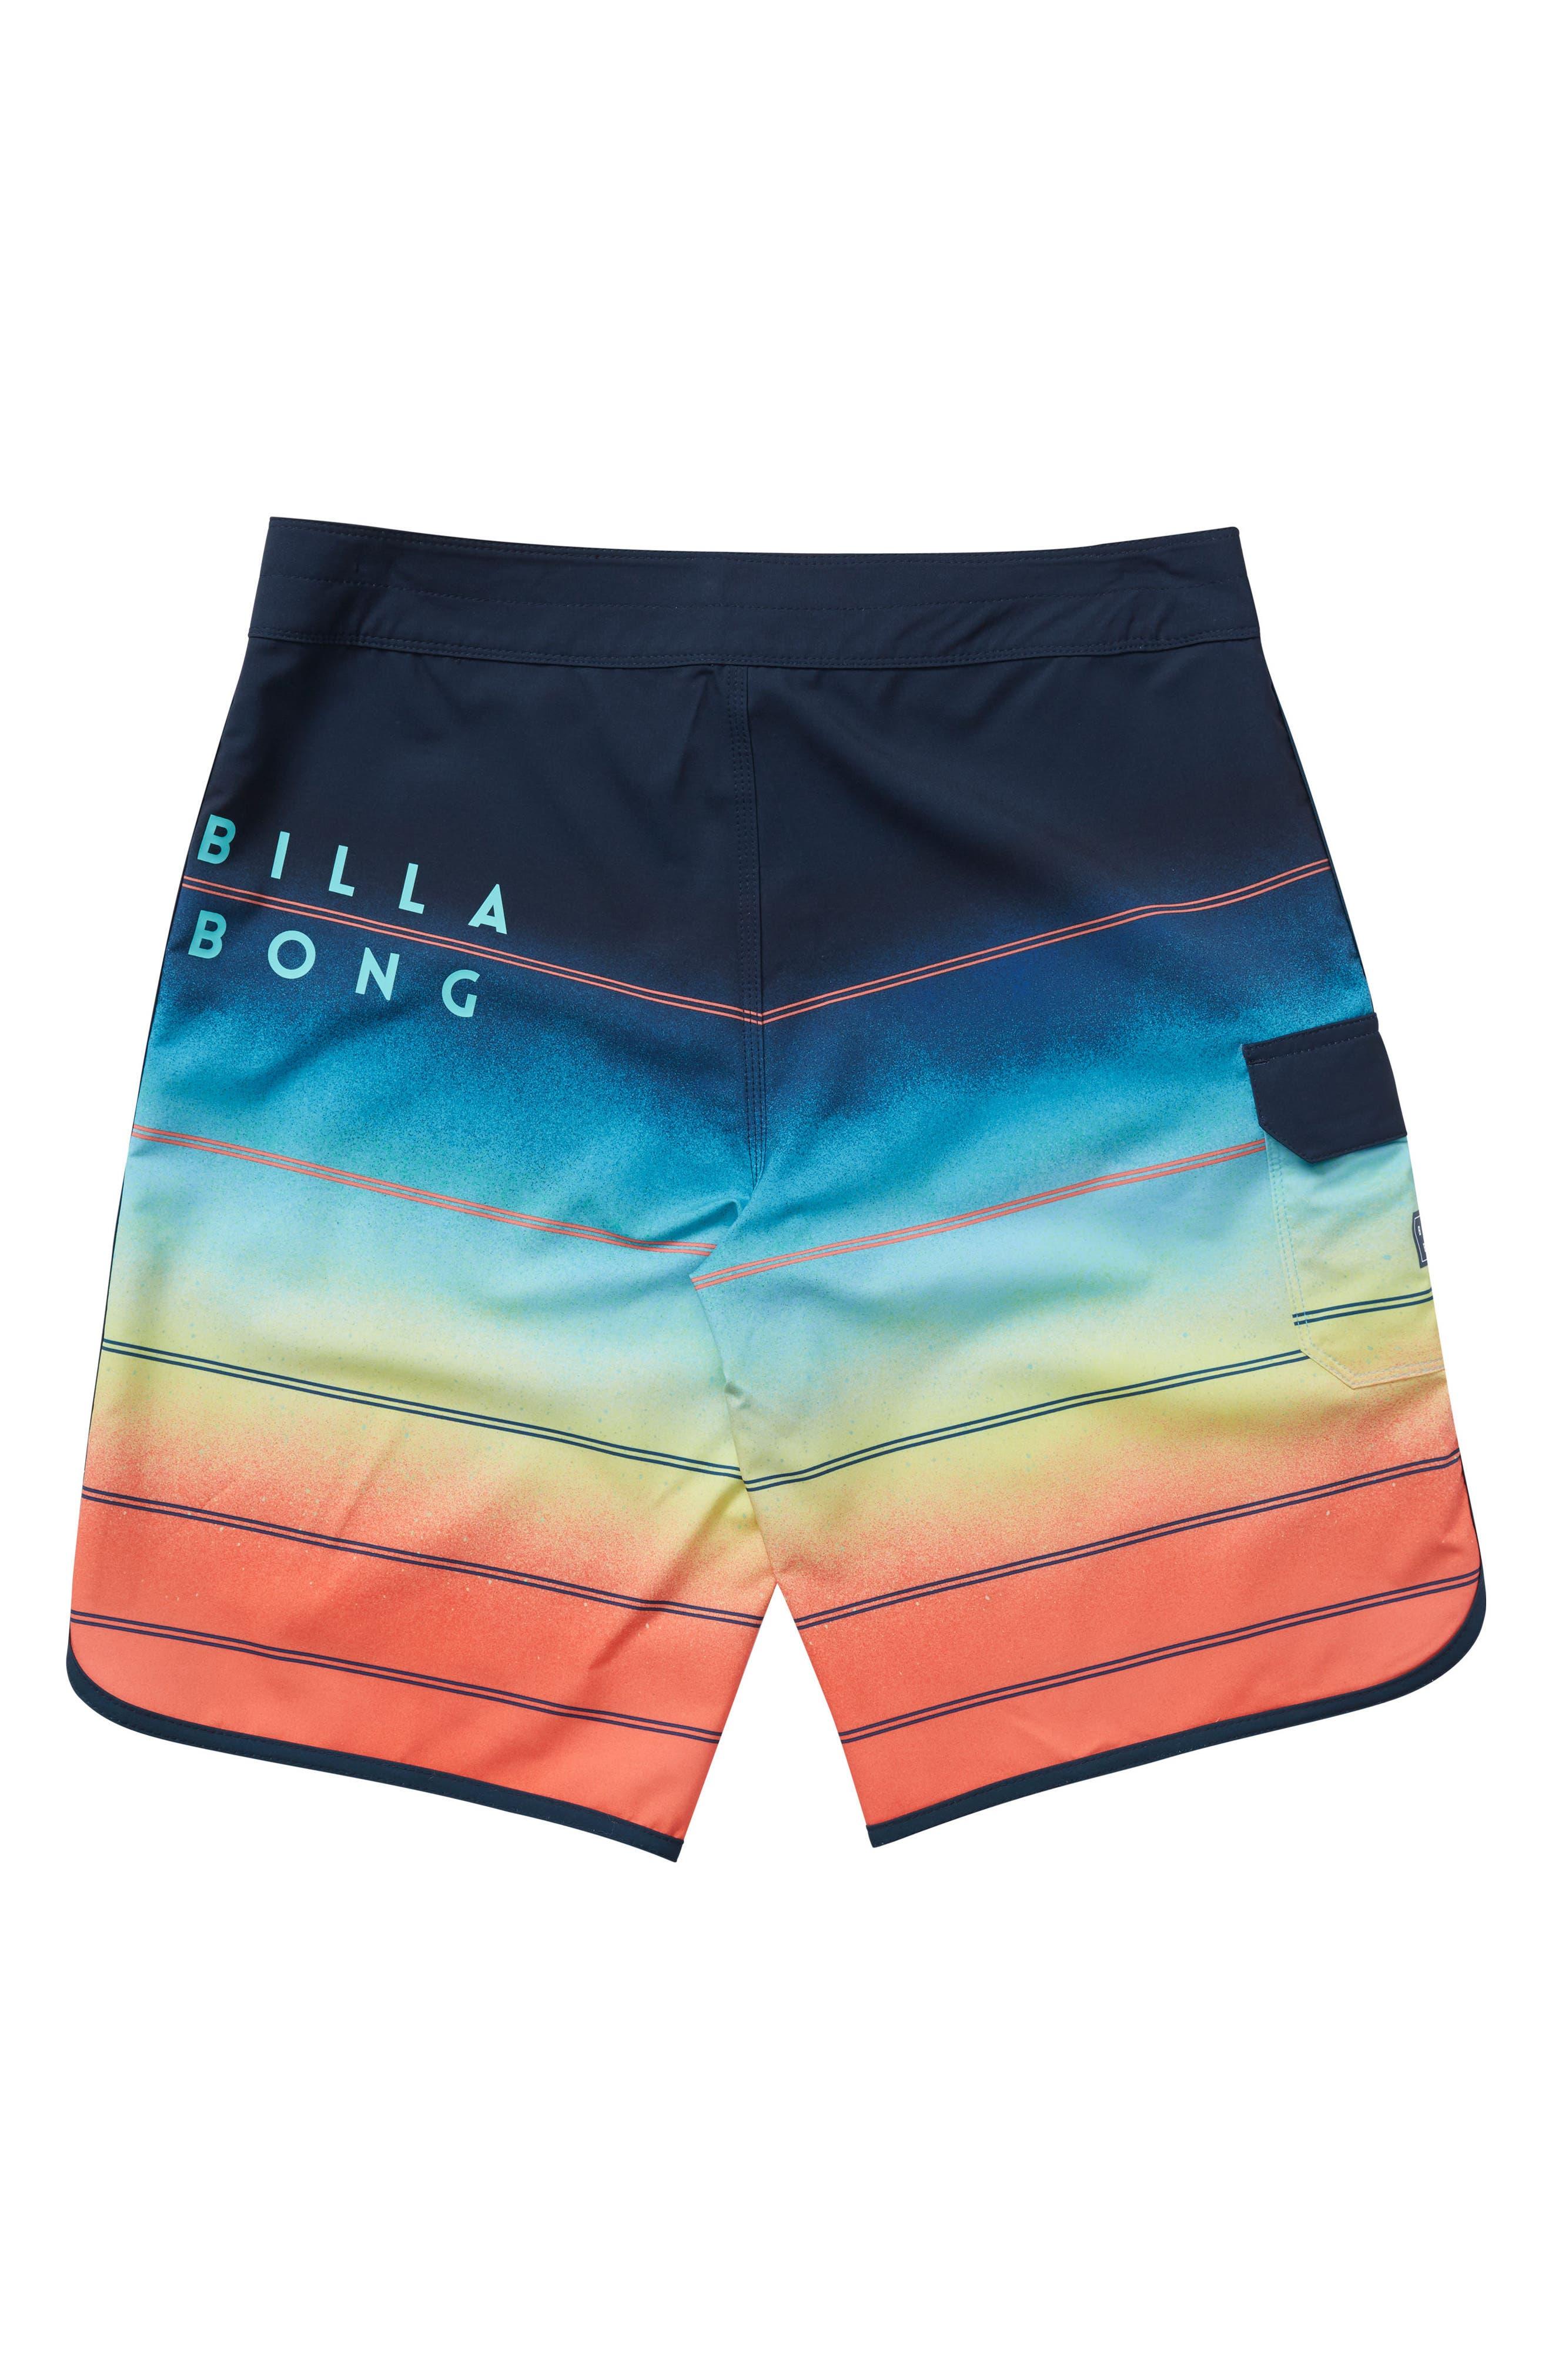 73 X Stripe Board Shorts,                             Alternate thumbnail 2, color,                             Orange